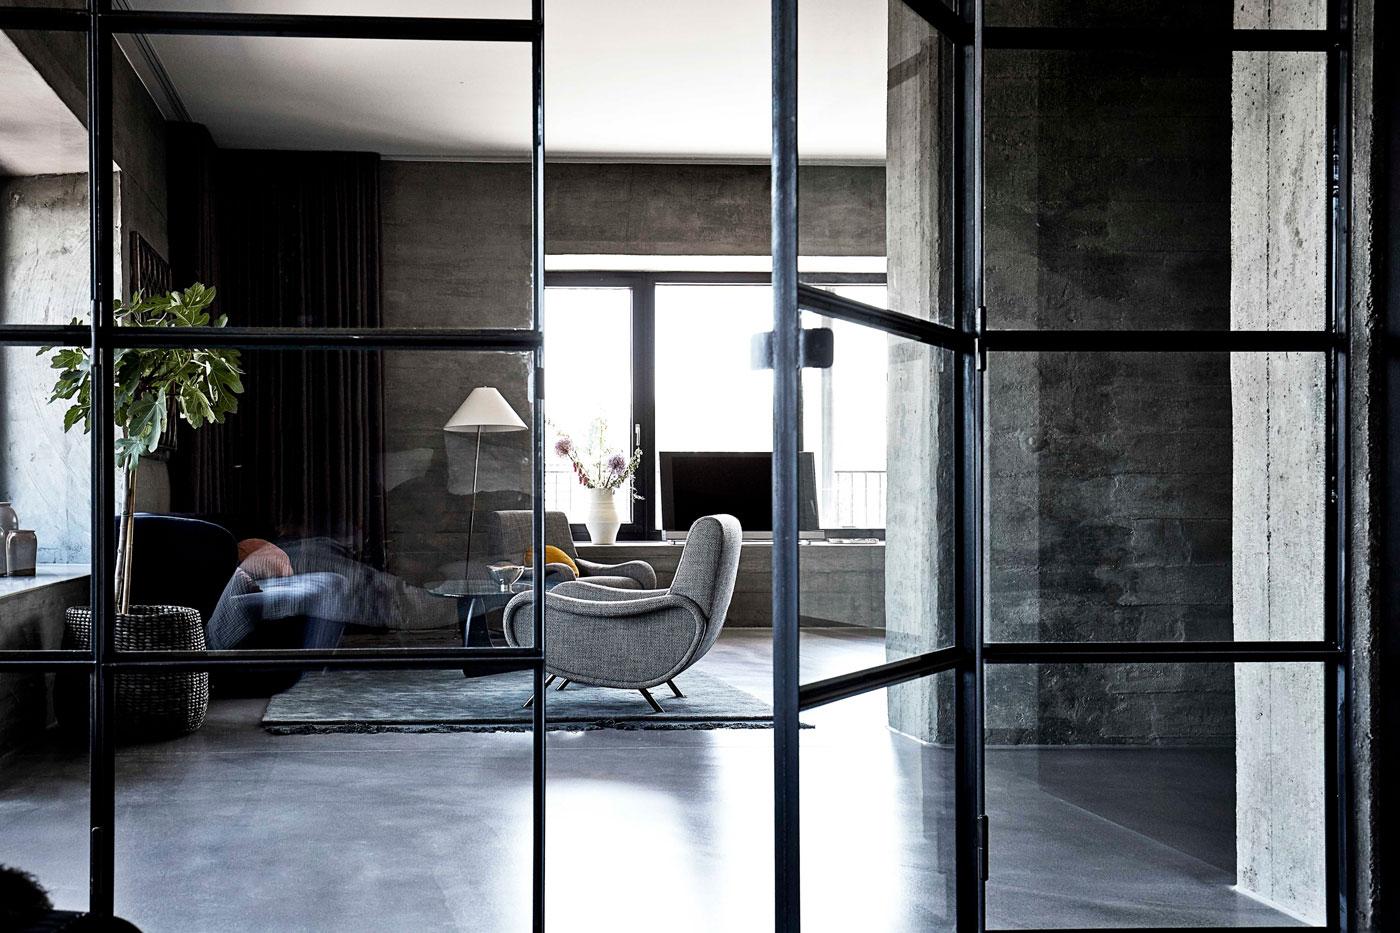 Grey chair, living room